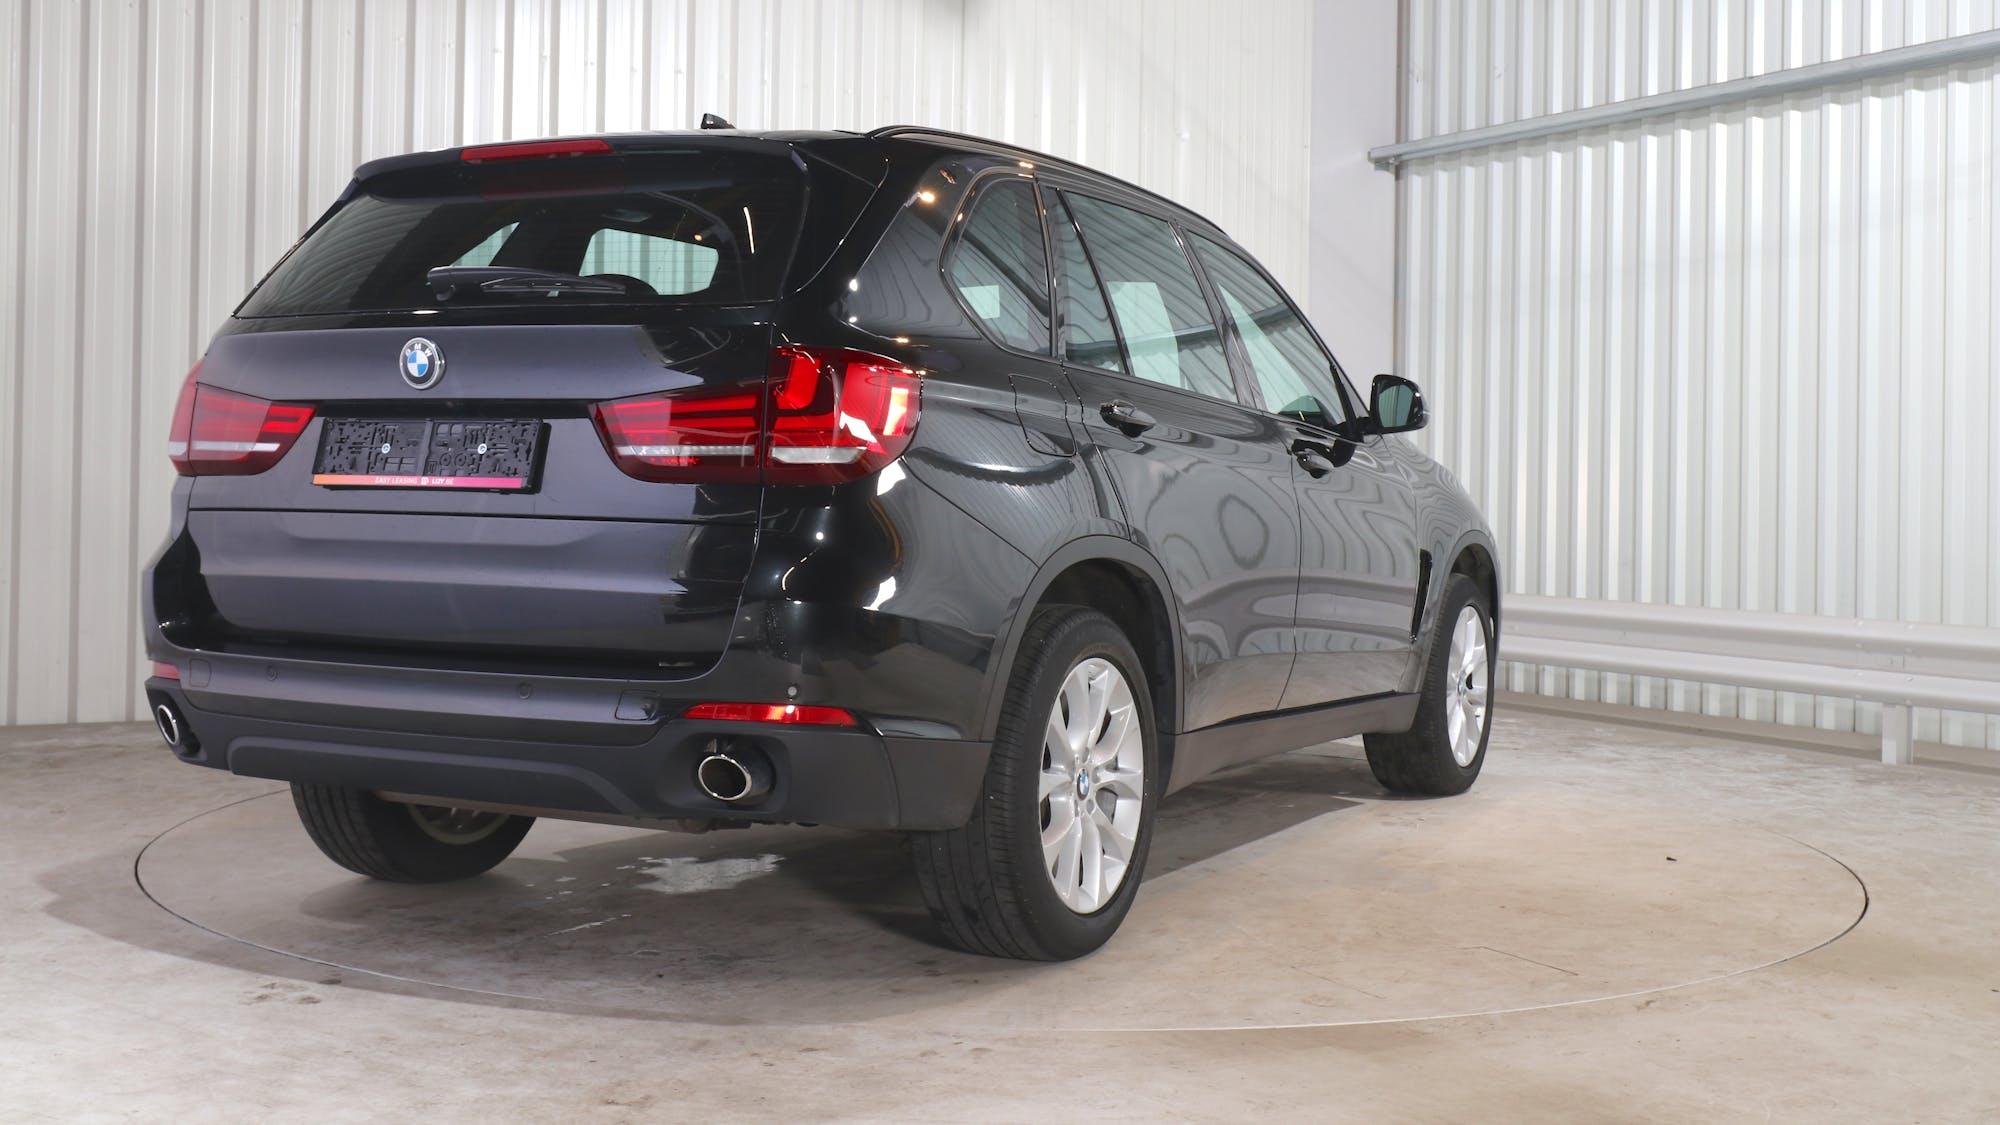 BMW X5 leasing exterior 6